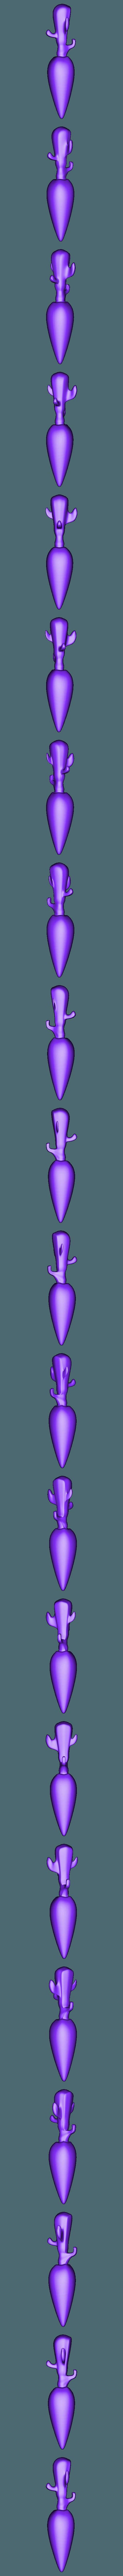 cactass.stl Download STL file cact-ass the butt plug • 3D printing design, monsterpiece